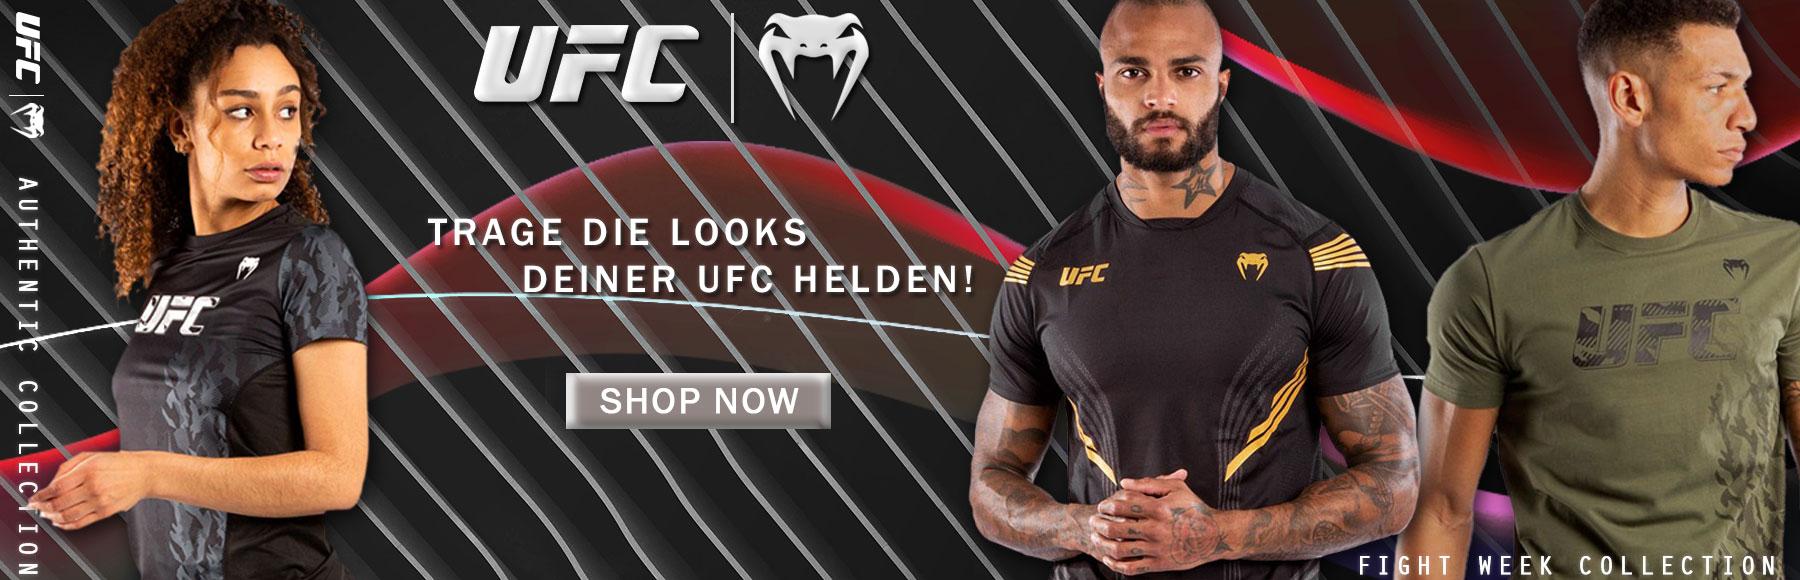 Venum x UFC New Collection